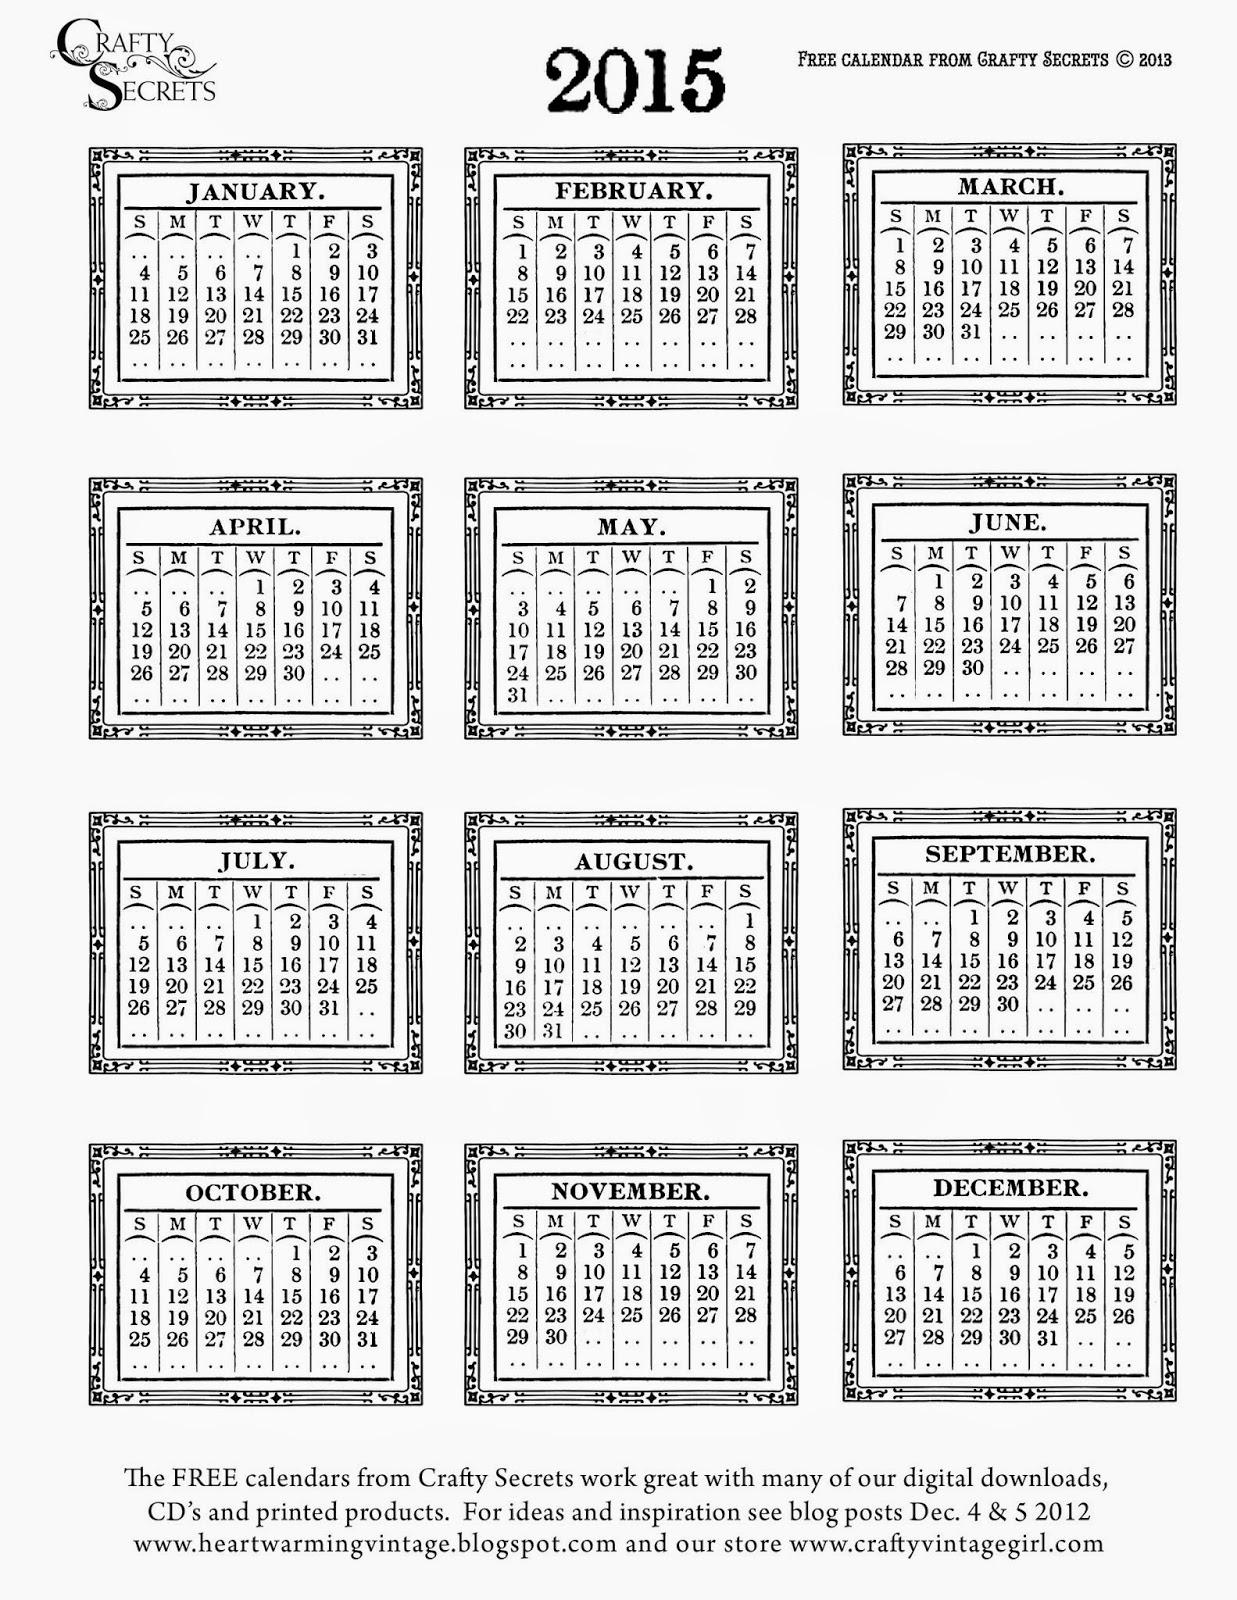 http://2.bp.blogspot.com/-s_PQ3W-Dy6k/VBdsrzhYV5I/AAAAAAAARys/vdEGgPAkhmM/s1600/2015_calendar_white_craftysecrets.jpg